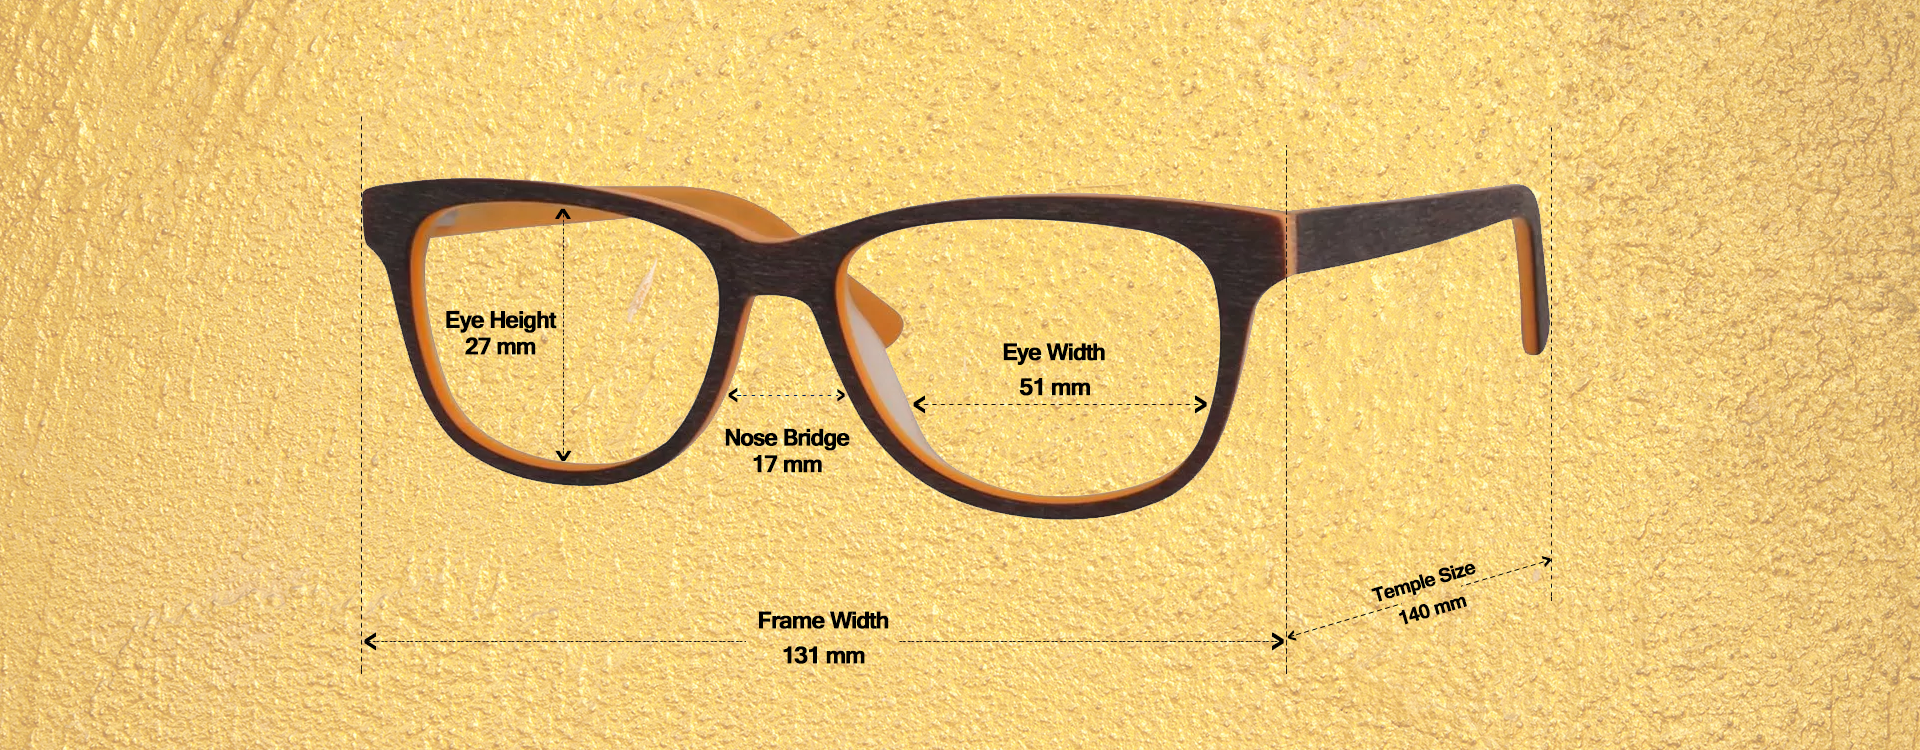 Reading Glasses Measurement